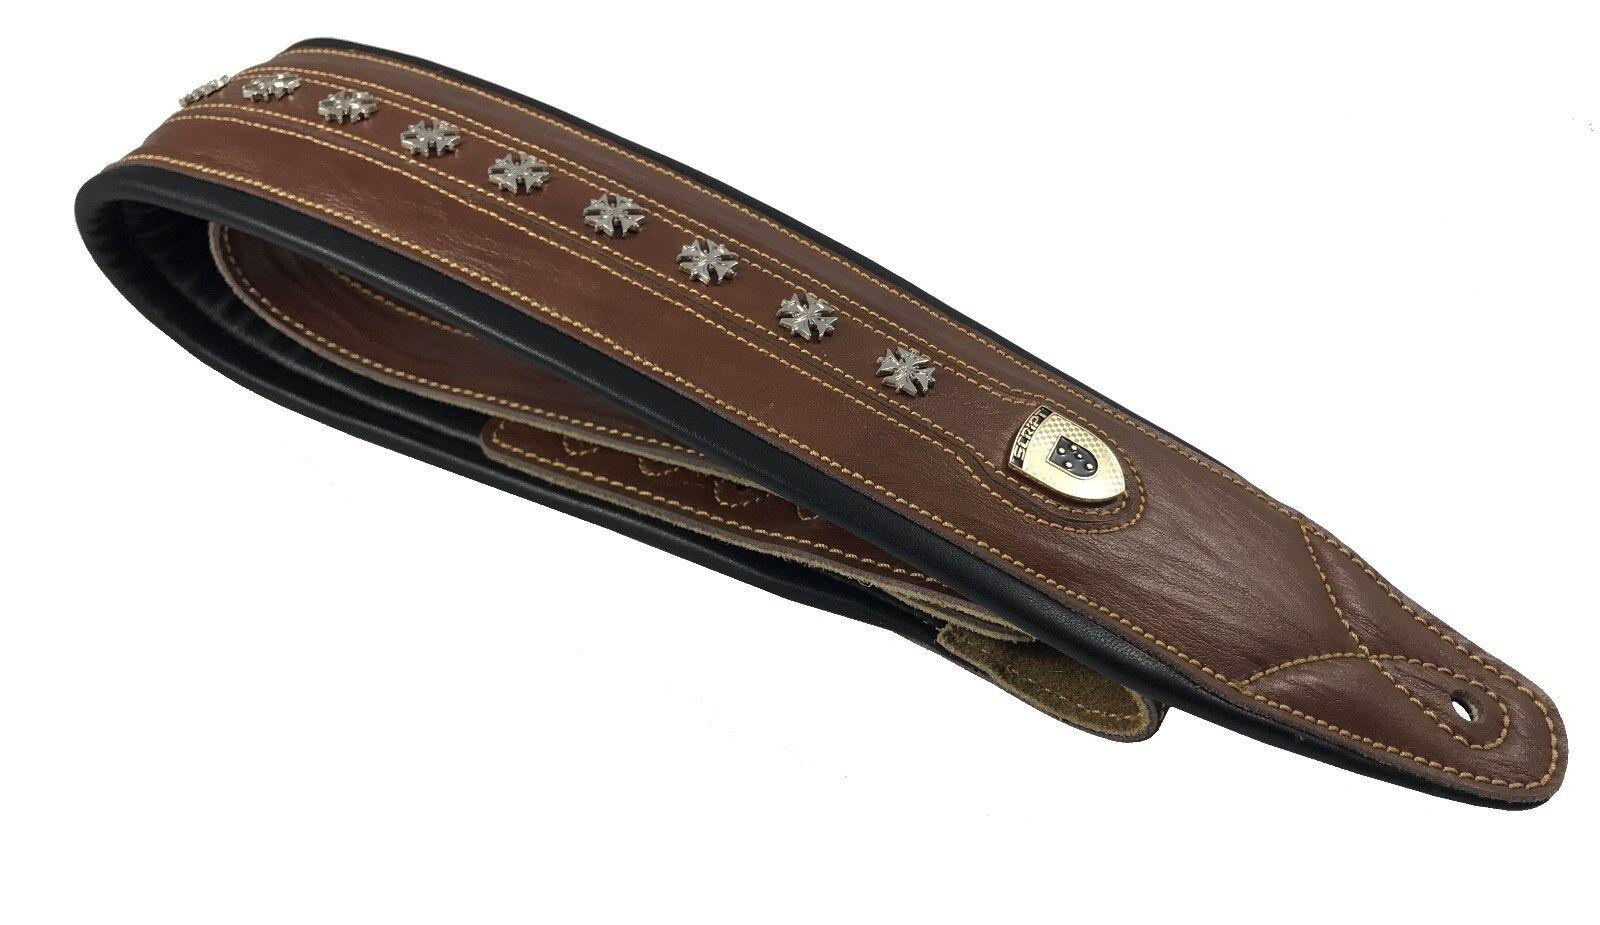 Genuine Leather Soft Padded Light Brown  IRON CROSS  SCRIPT Supreme Guitar Strap